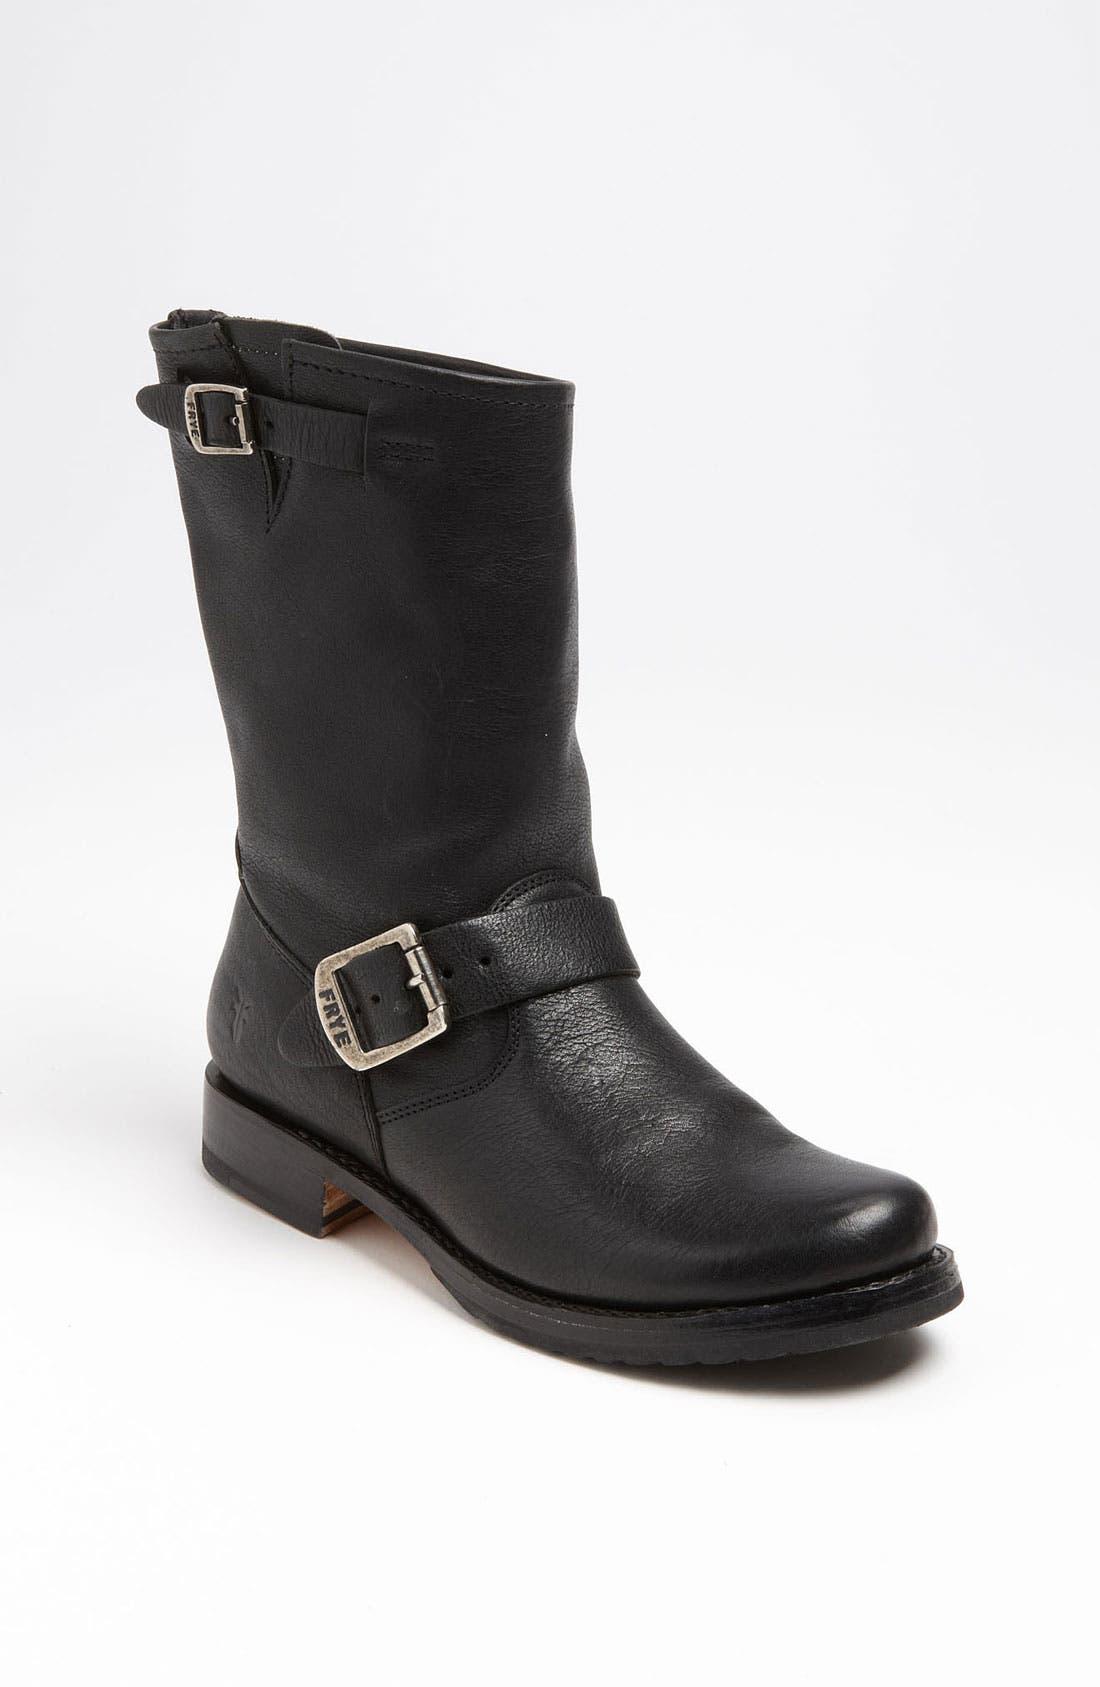 Main Image - Frye 'Veronica' Short Boot